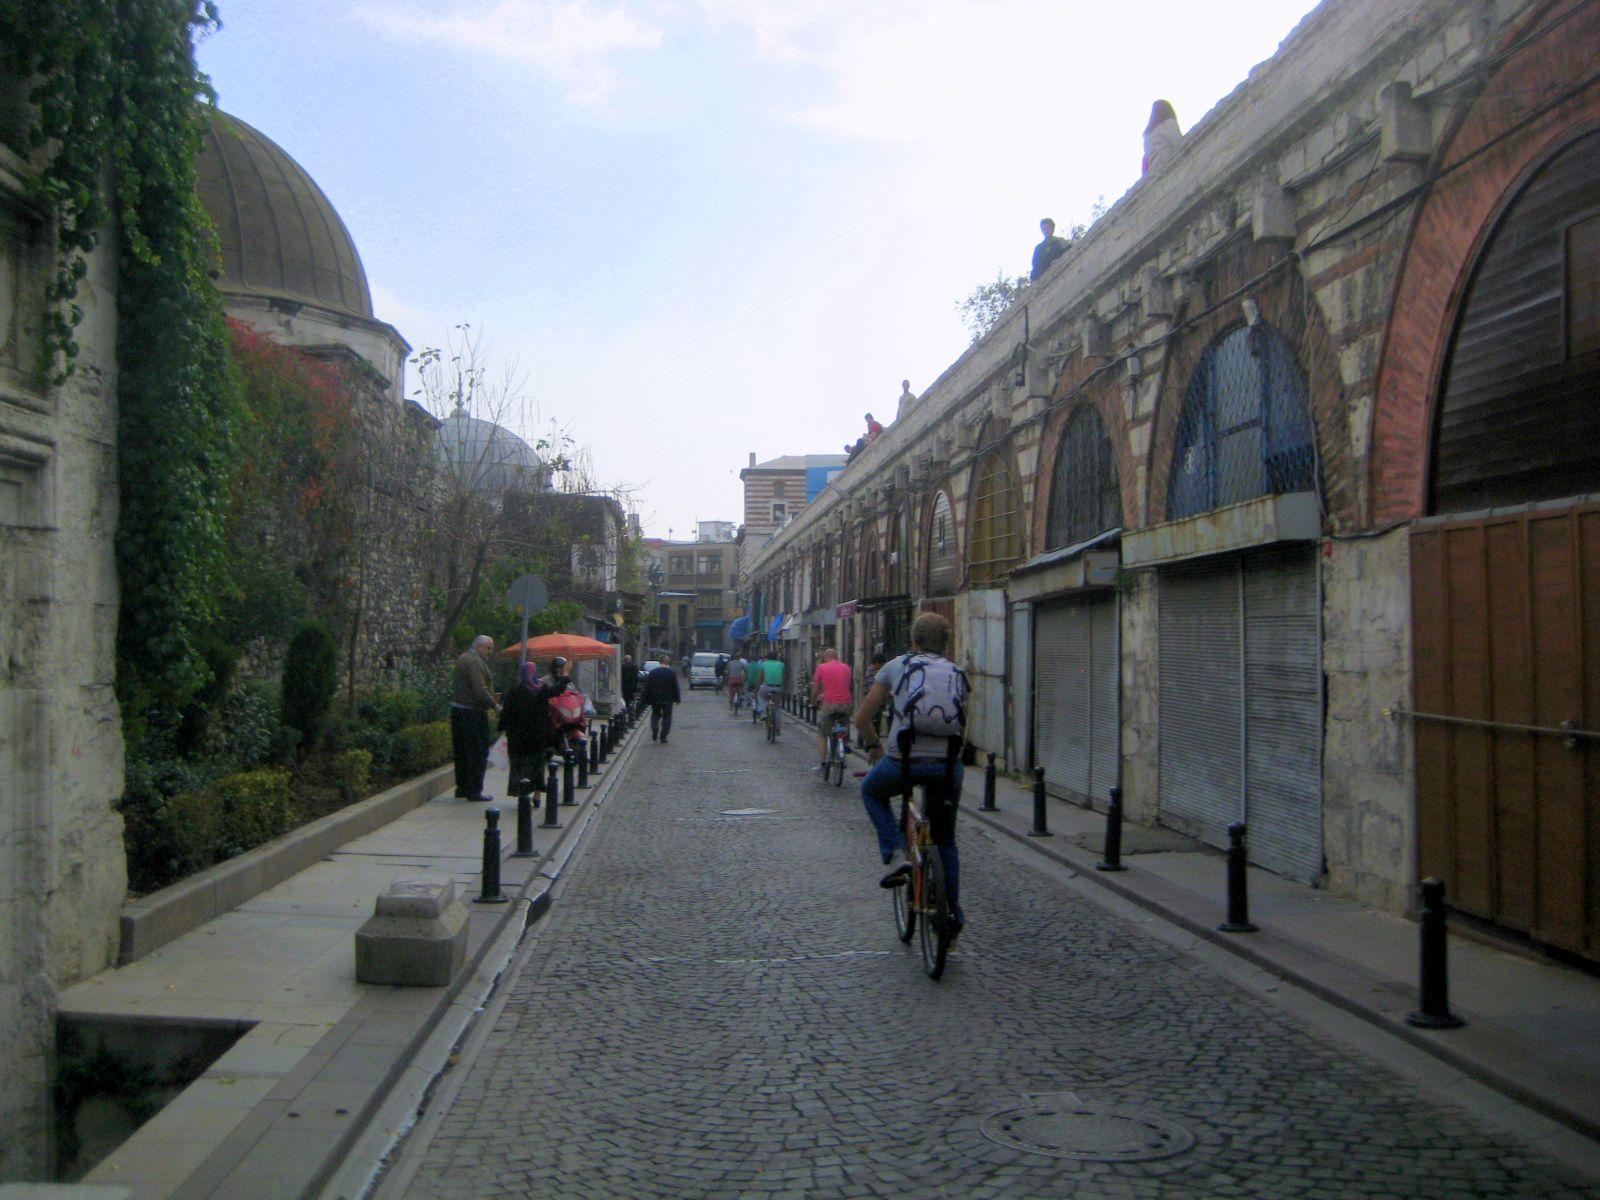 Street at Suleymaniye Mosque